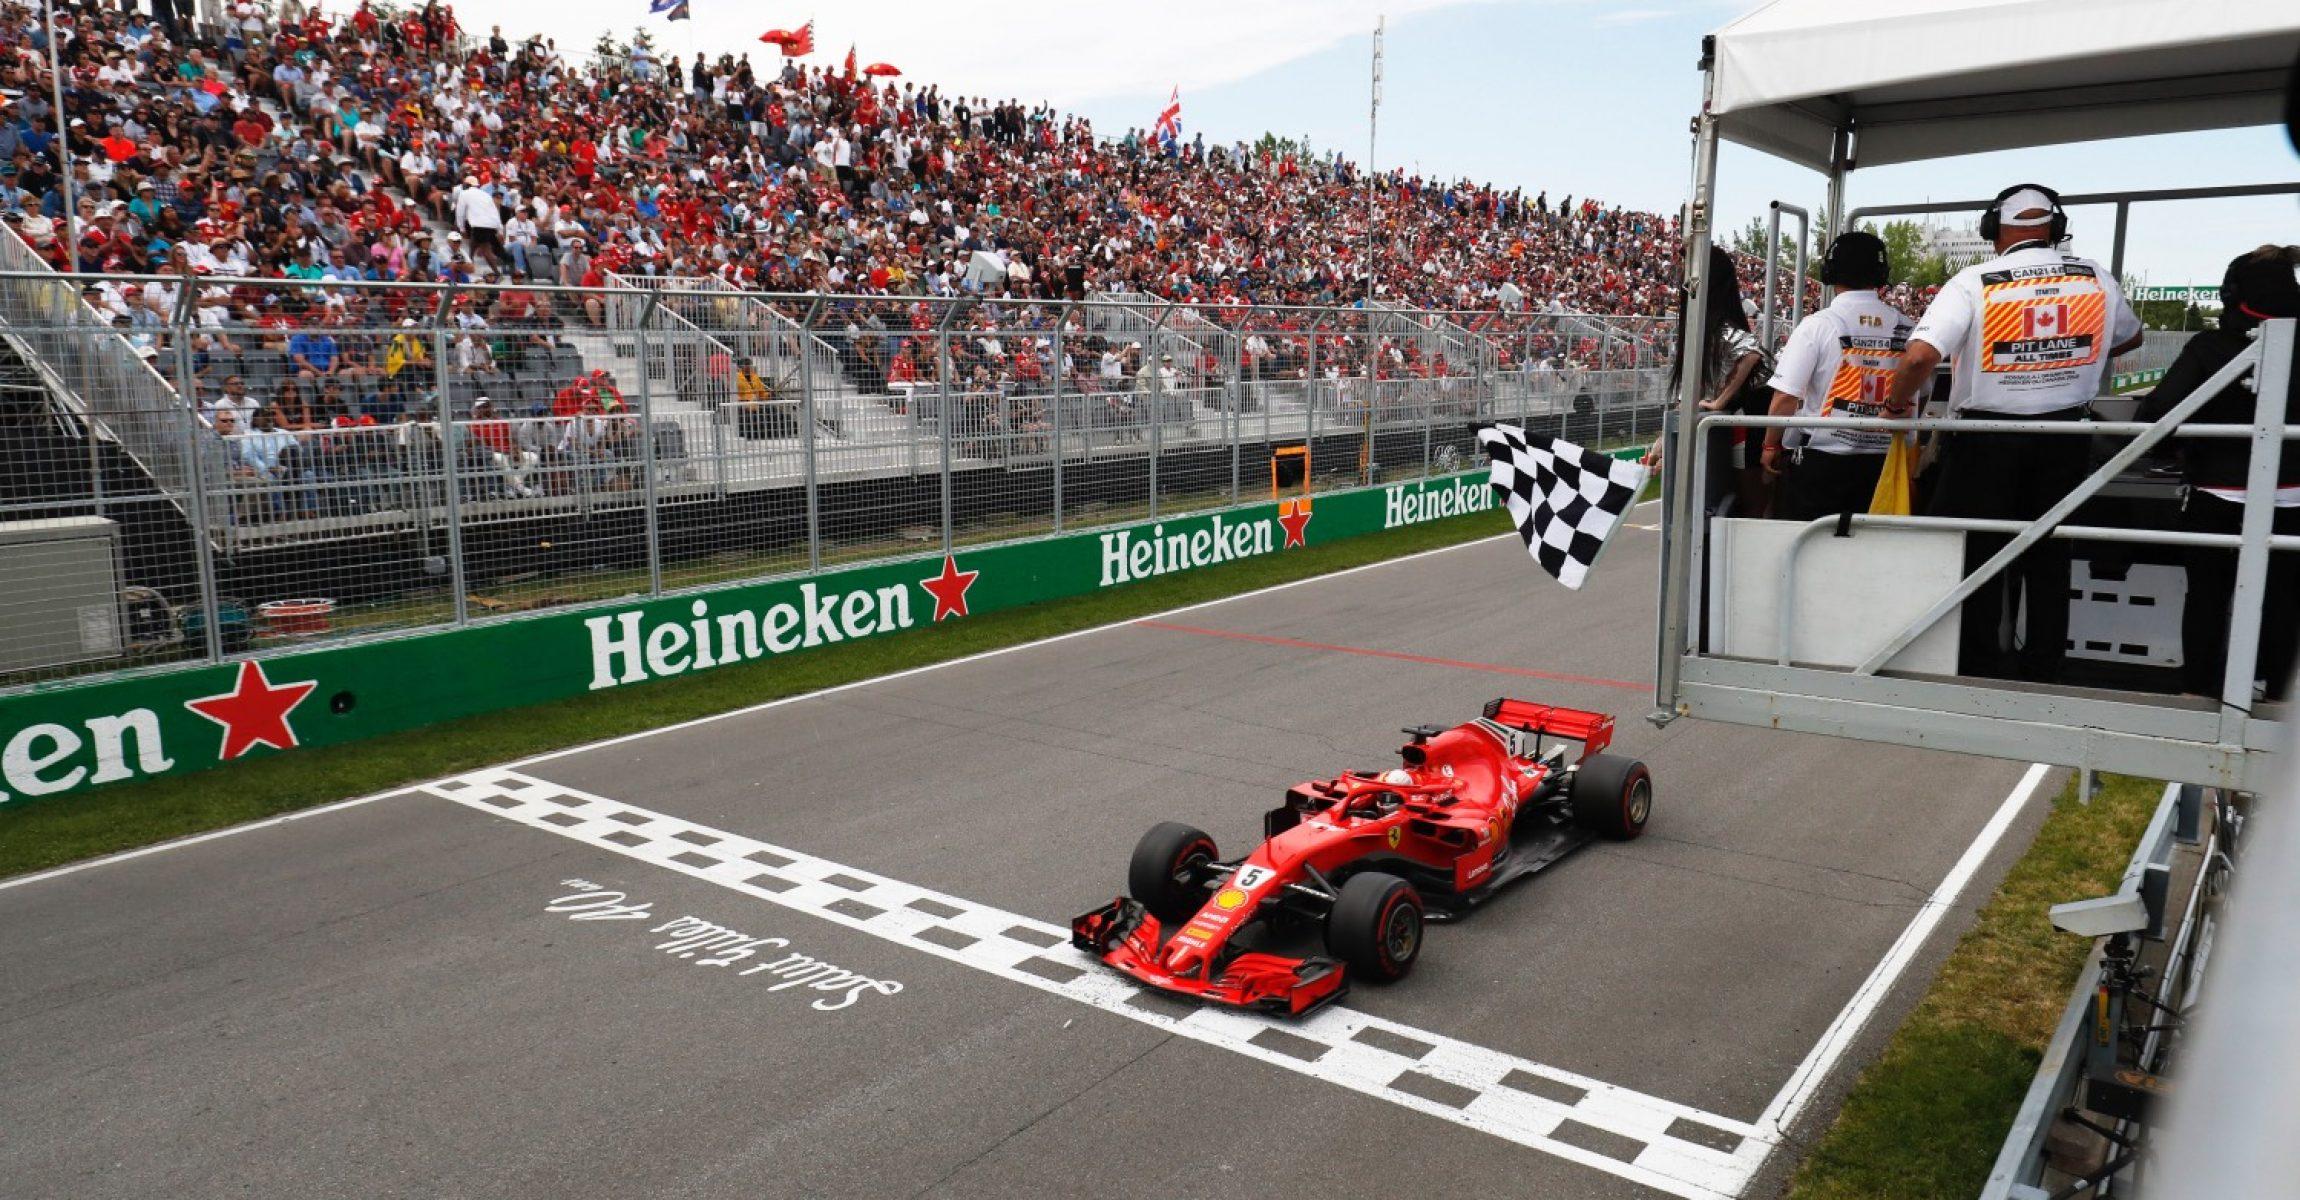 Sebastian Vettel, Ferrari, supermodel Winnie Harlow chequered flag